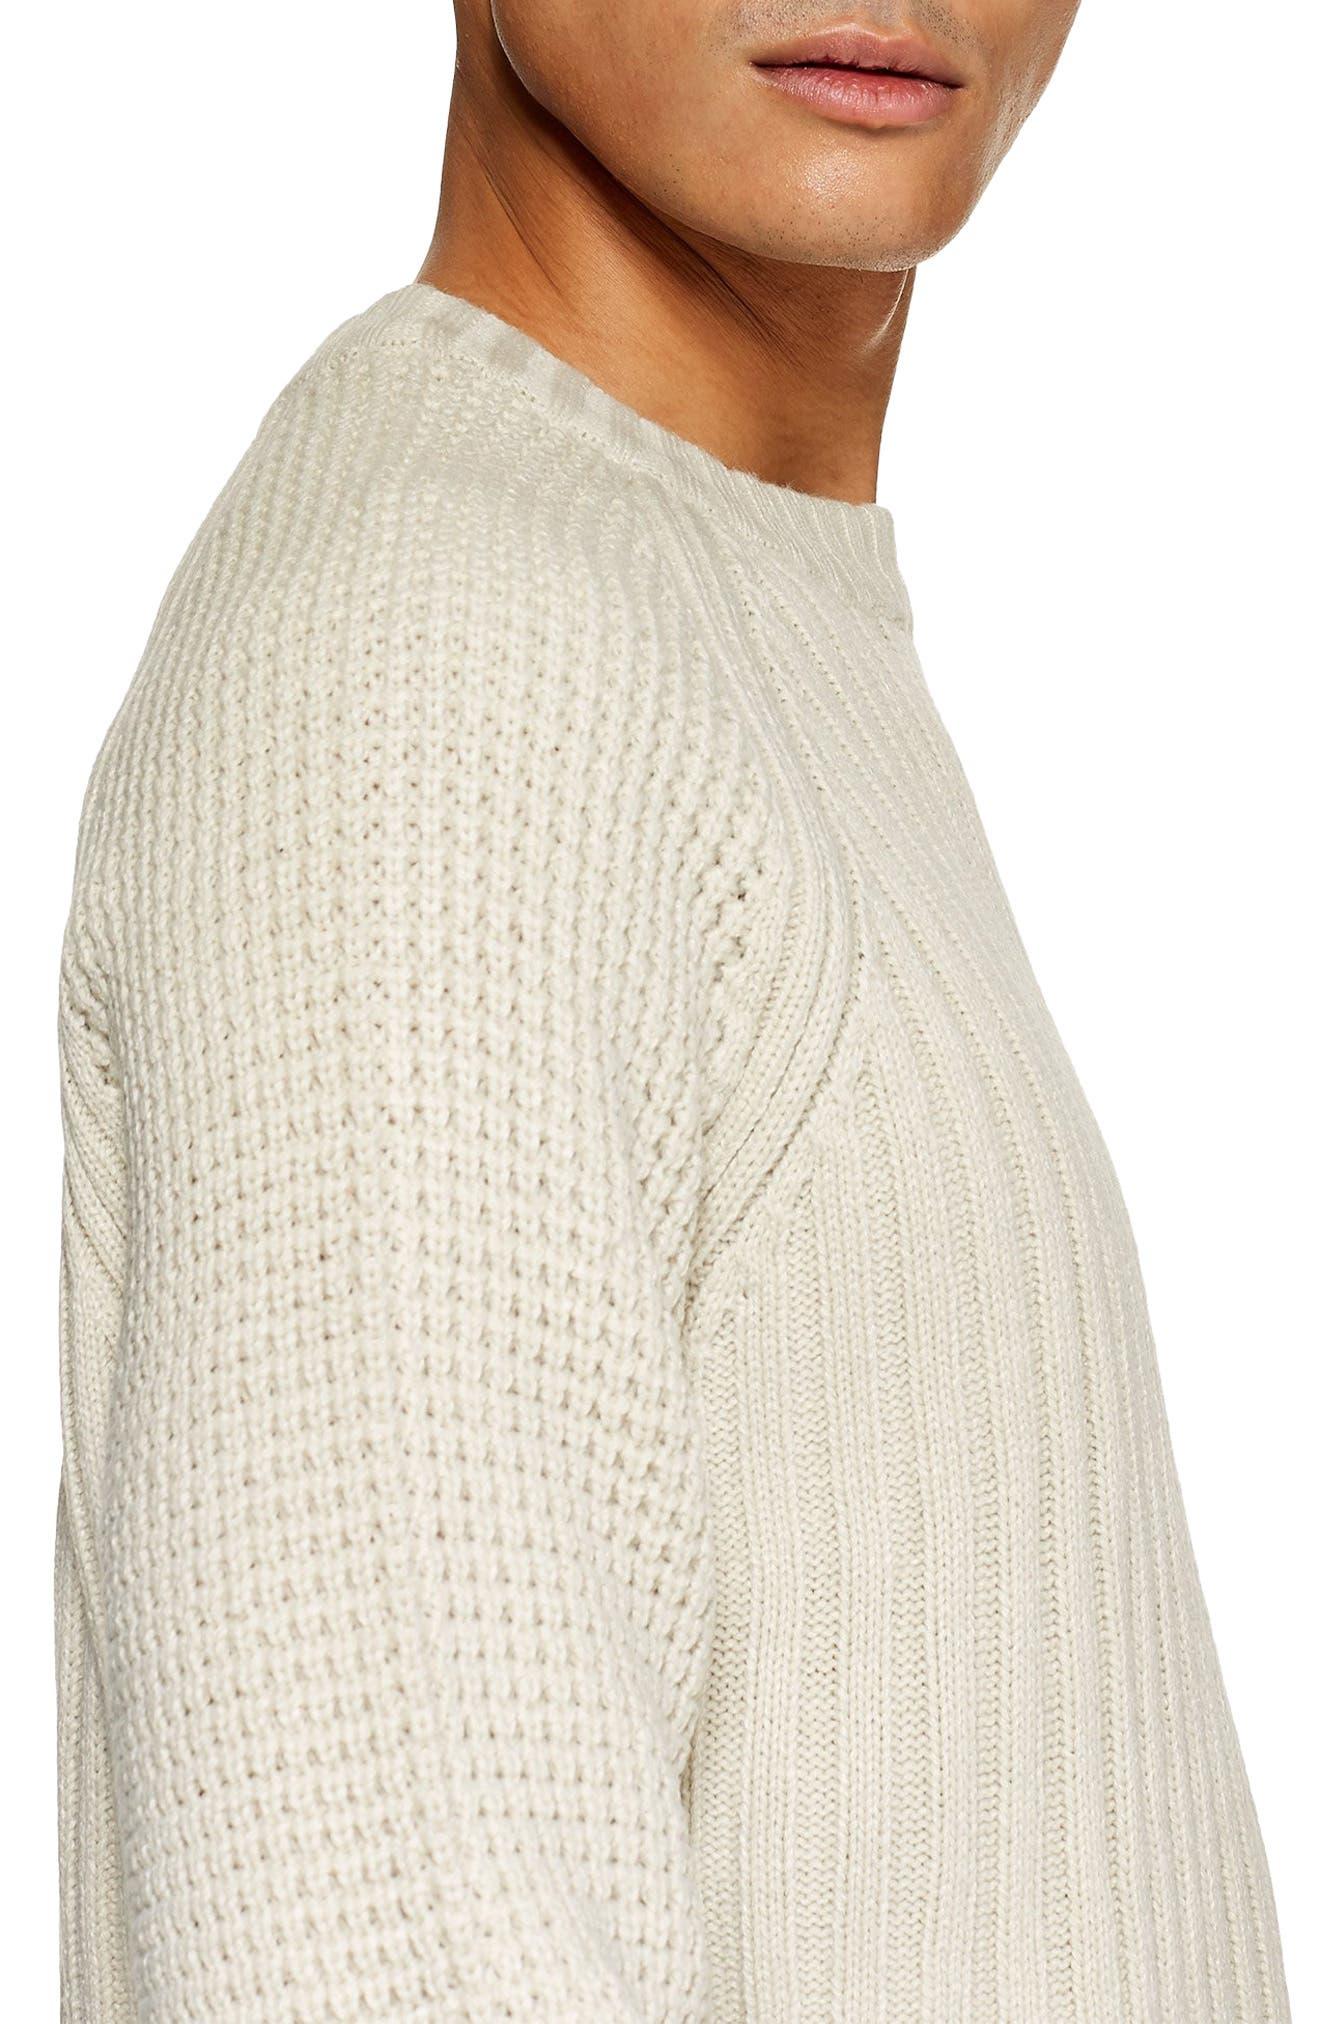 Mixed Stitch Classic Crewneck Sweater,                             Alternate thumbnail 3, color,                             STONE